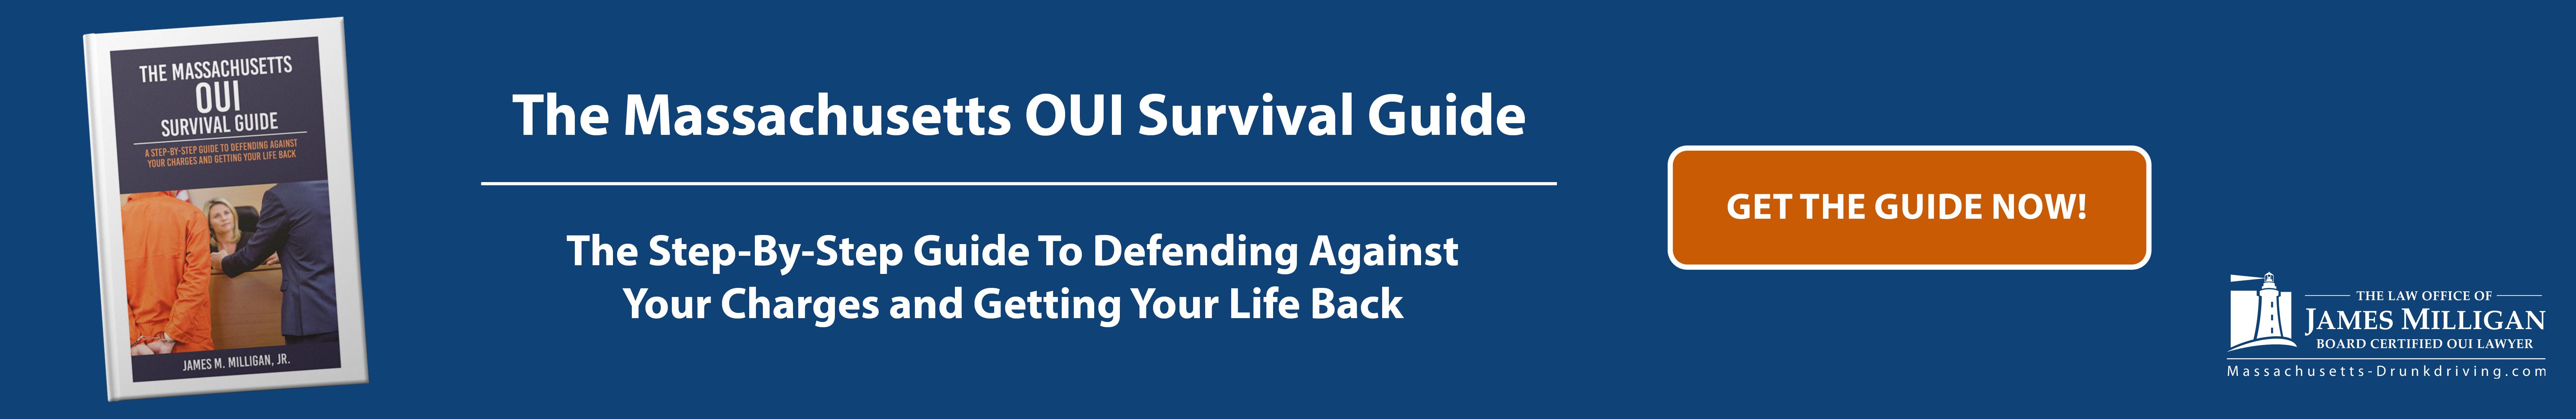 The Massachusetts OUI Survival Guide